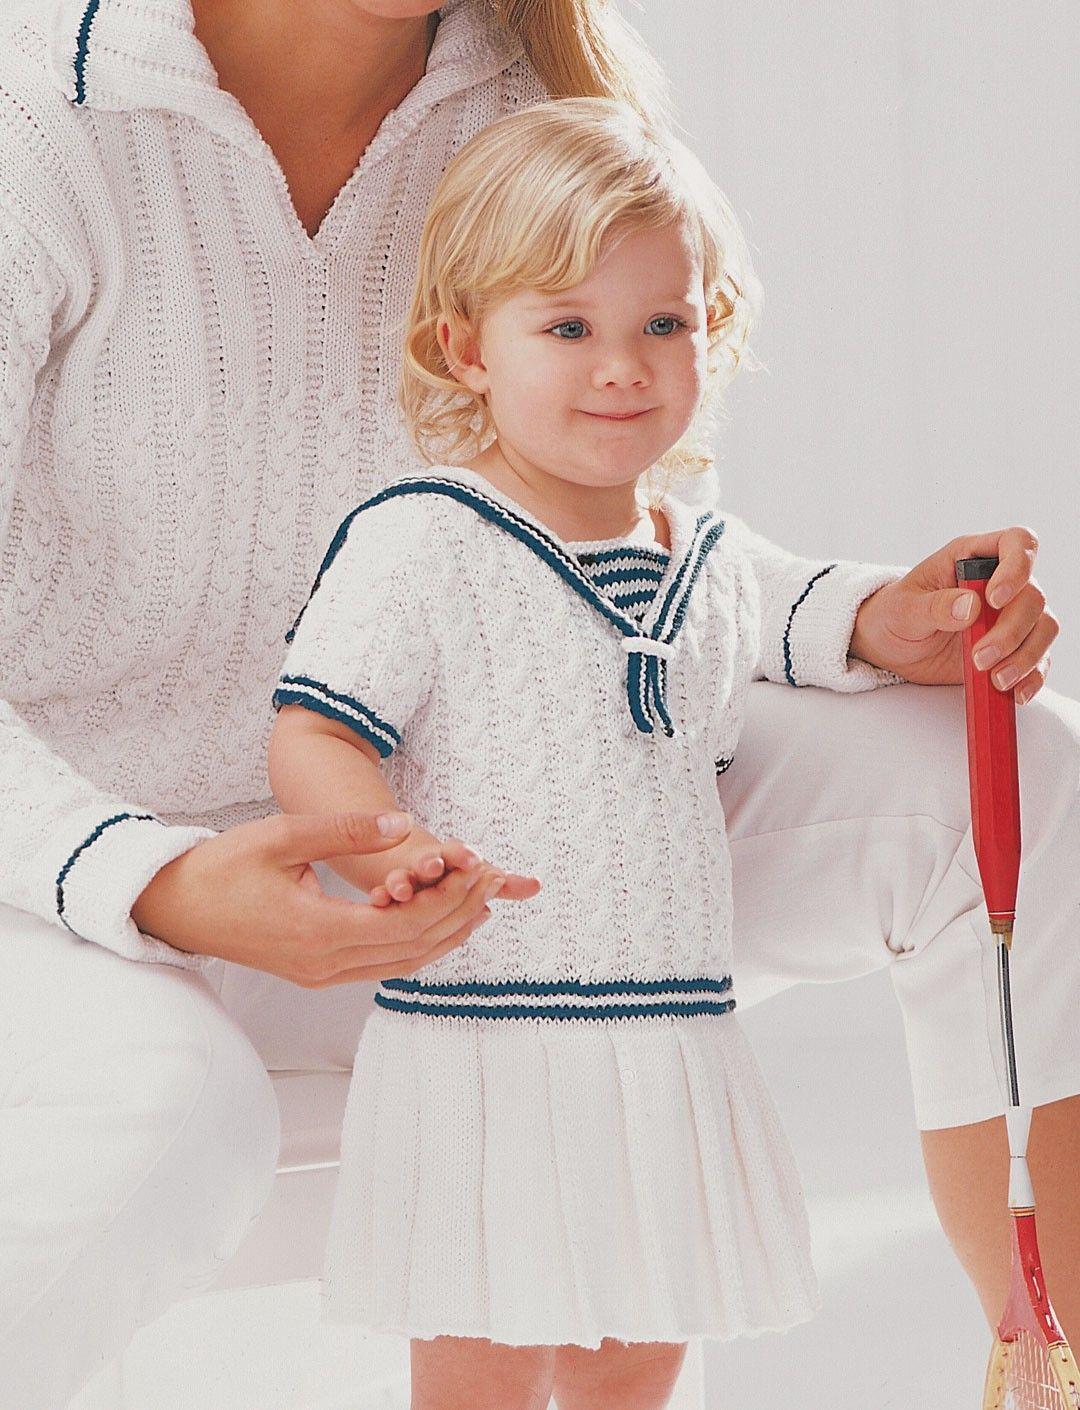 Yarnspirations.com - Patons Sailor Dress - Patterns | Yarnspirations ...